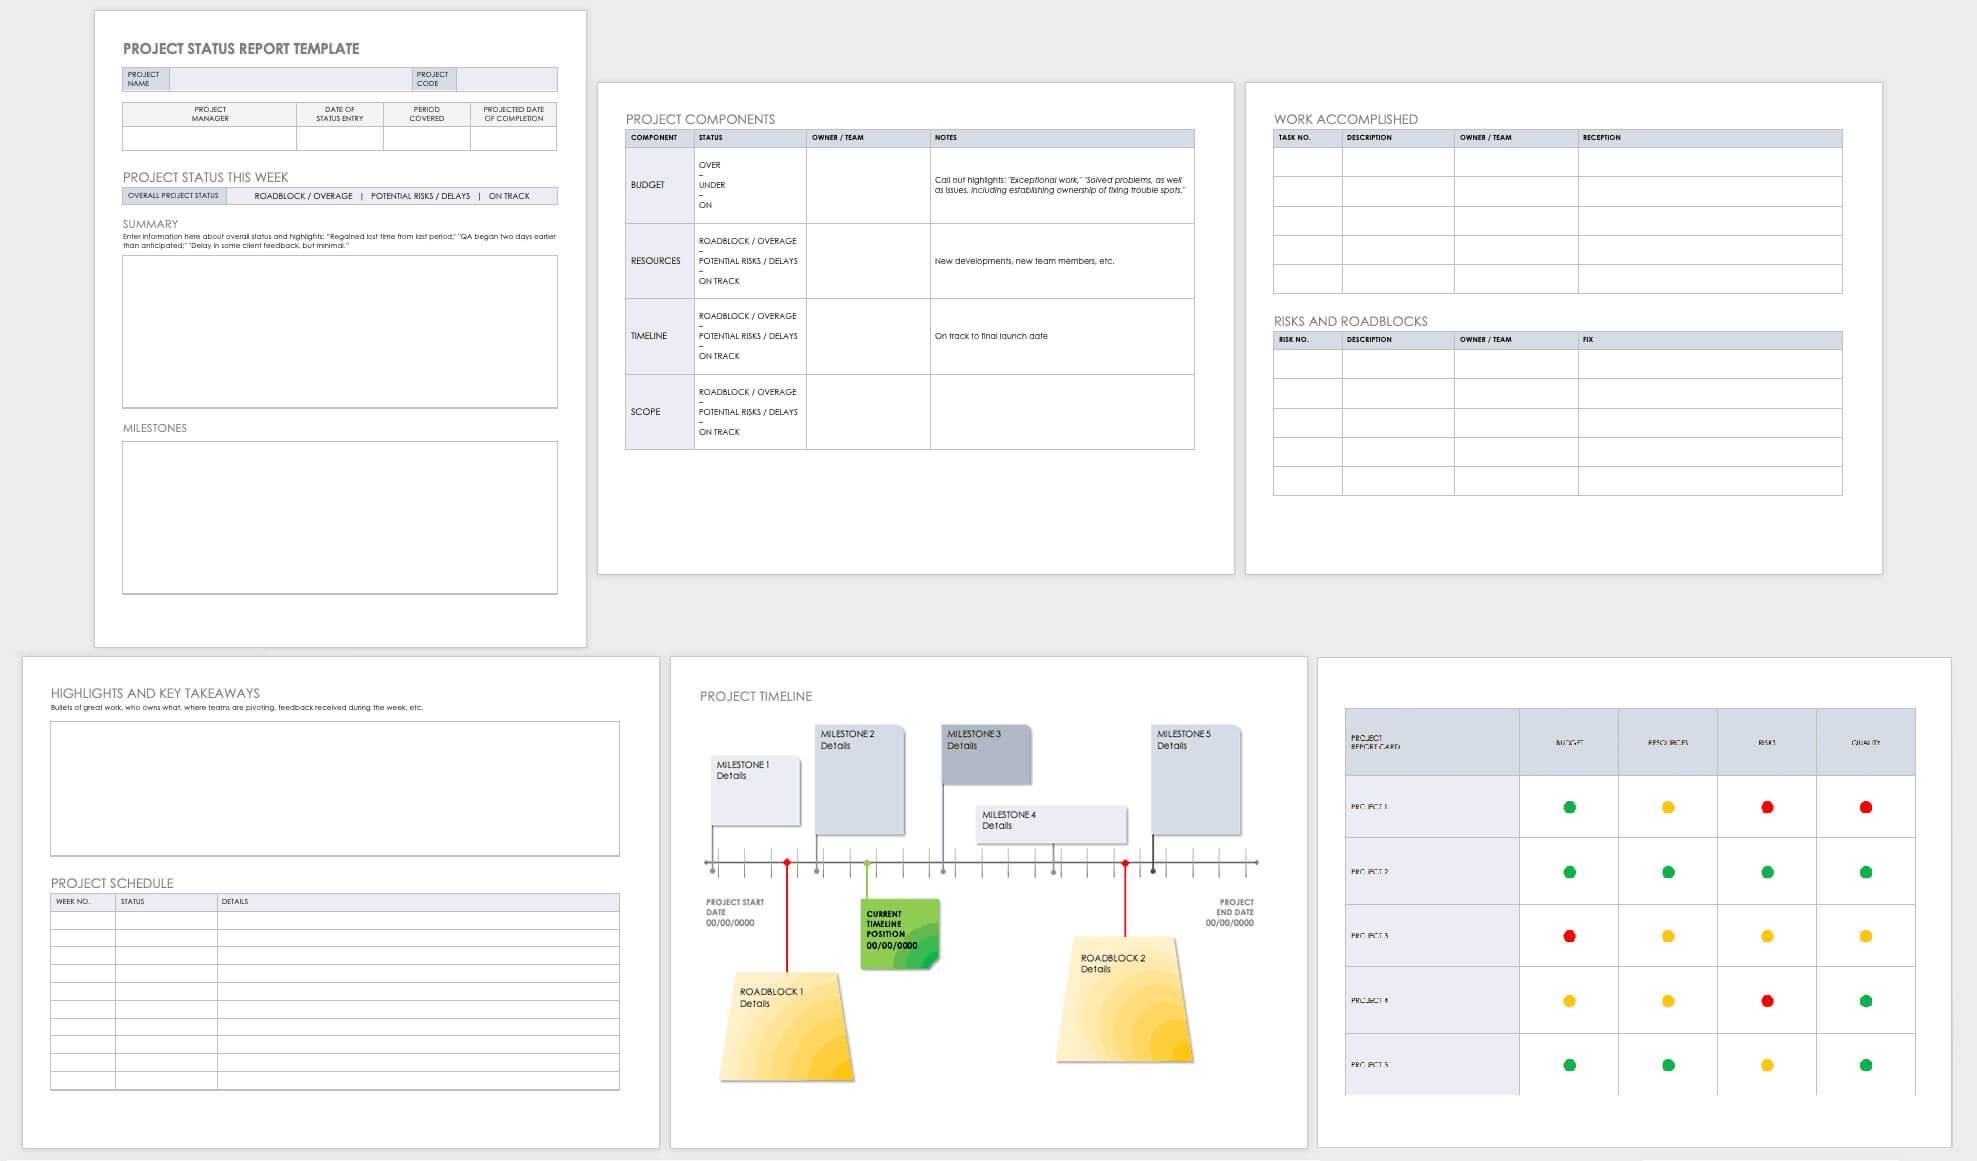 Free Project Report Templates   Smartsheet regarding Software Problem Report Template